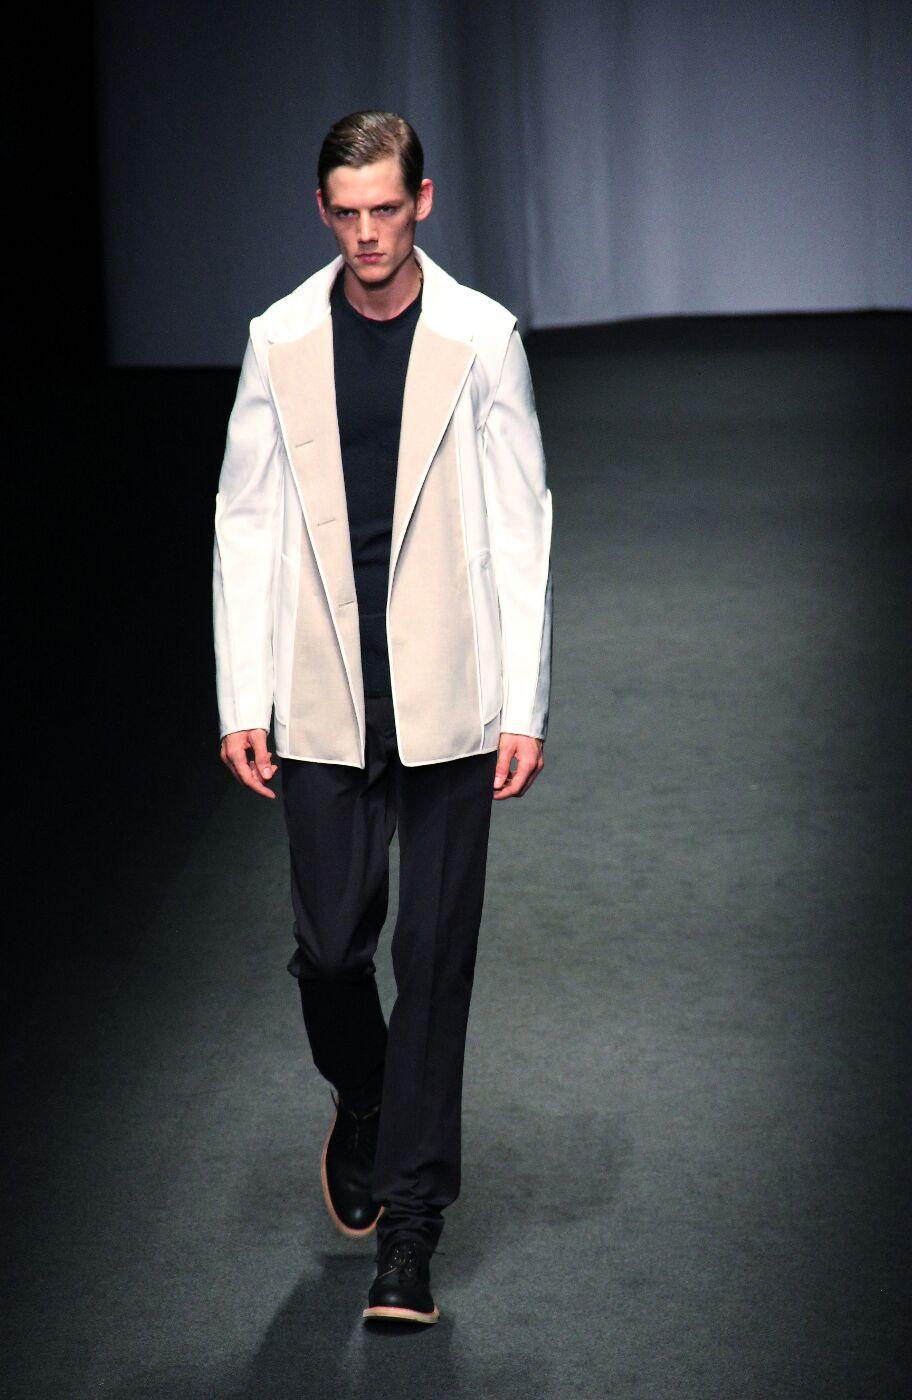 nicole-farhi-ss-spring-summer-2012-milano-fashion-week-nicole-farhi